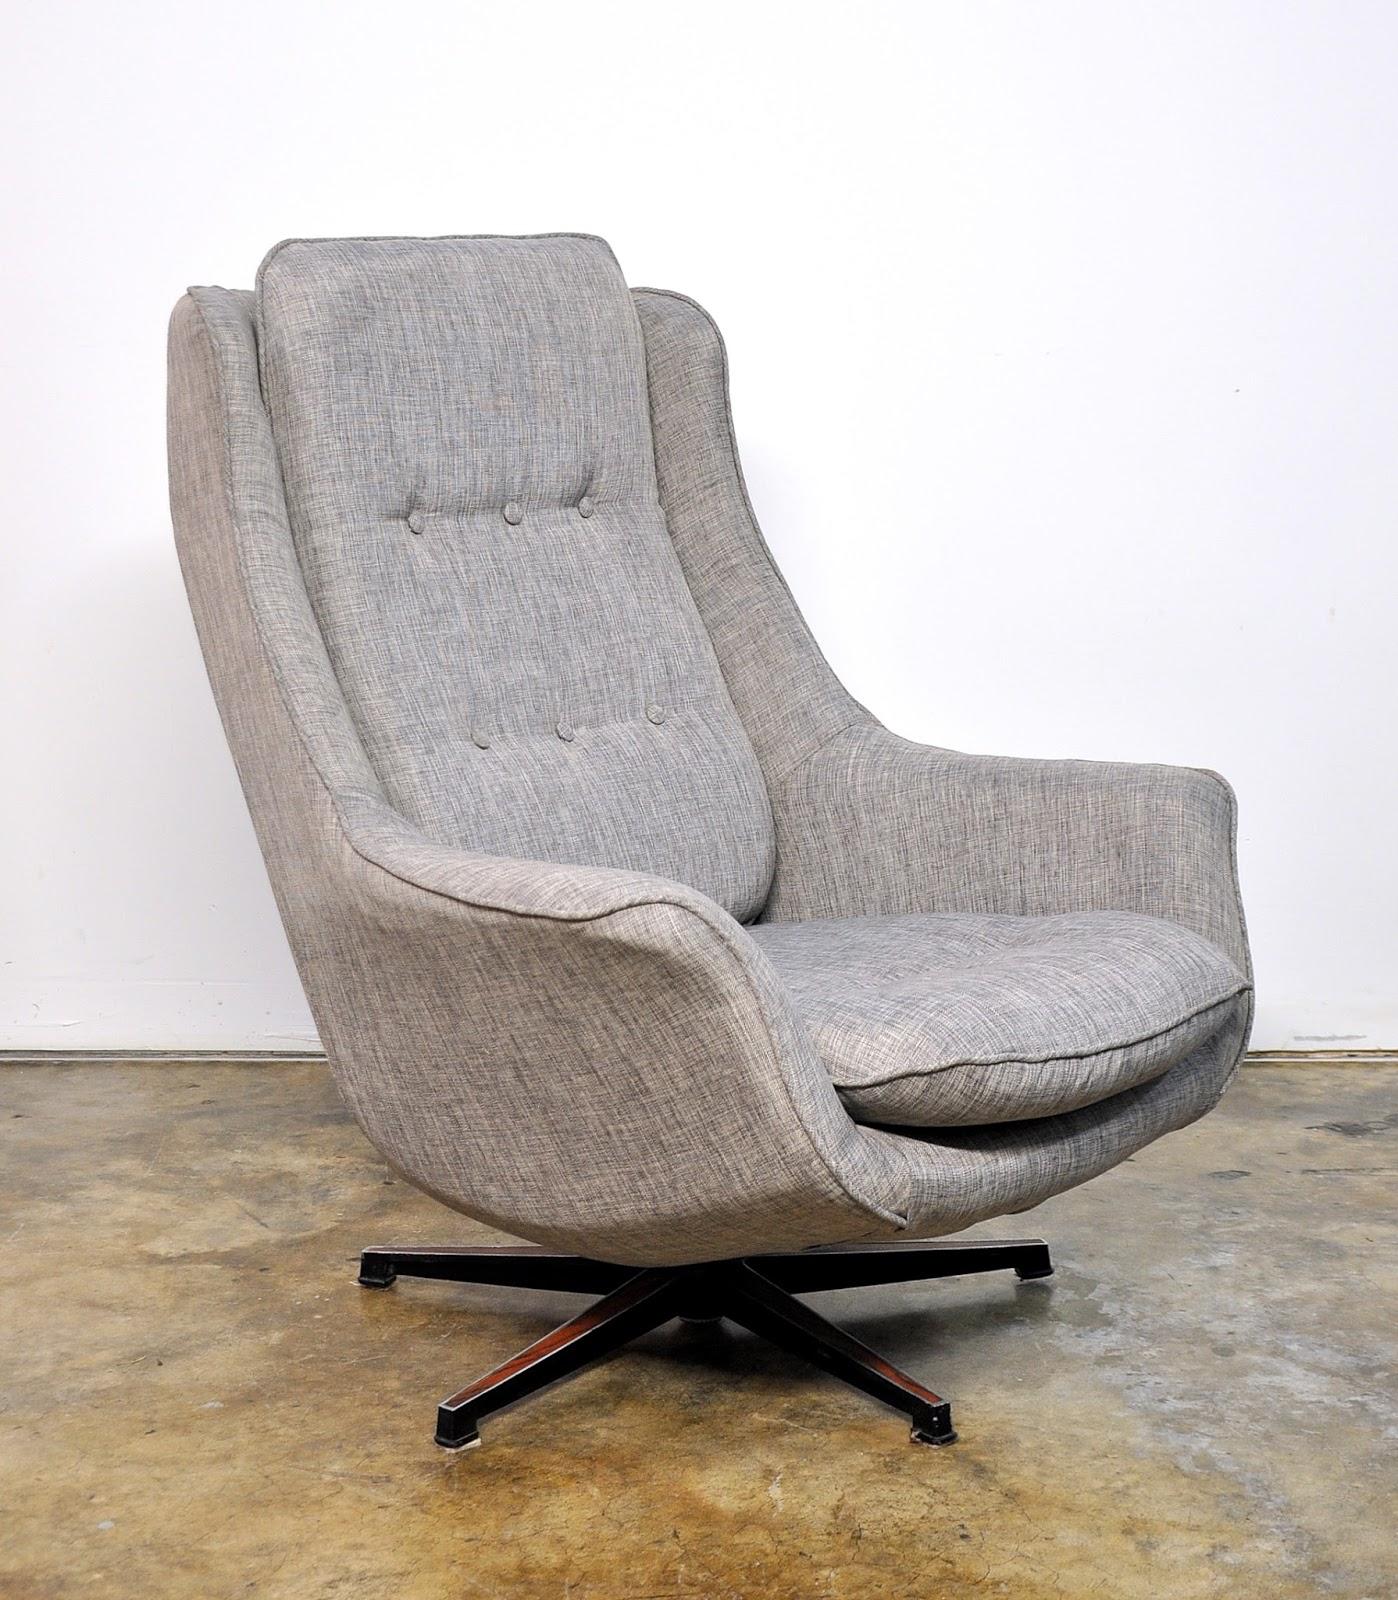 SELECT MODERN: Mid Century Swivel Lounge Chair